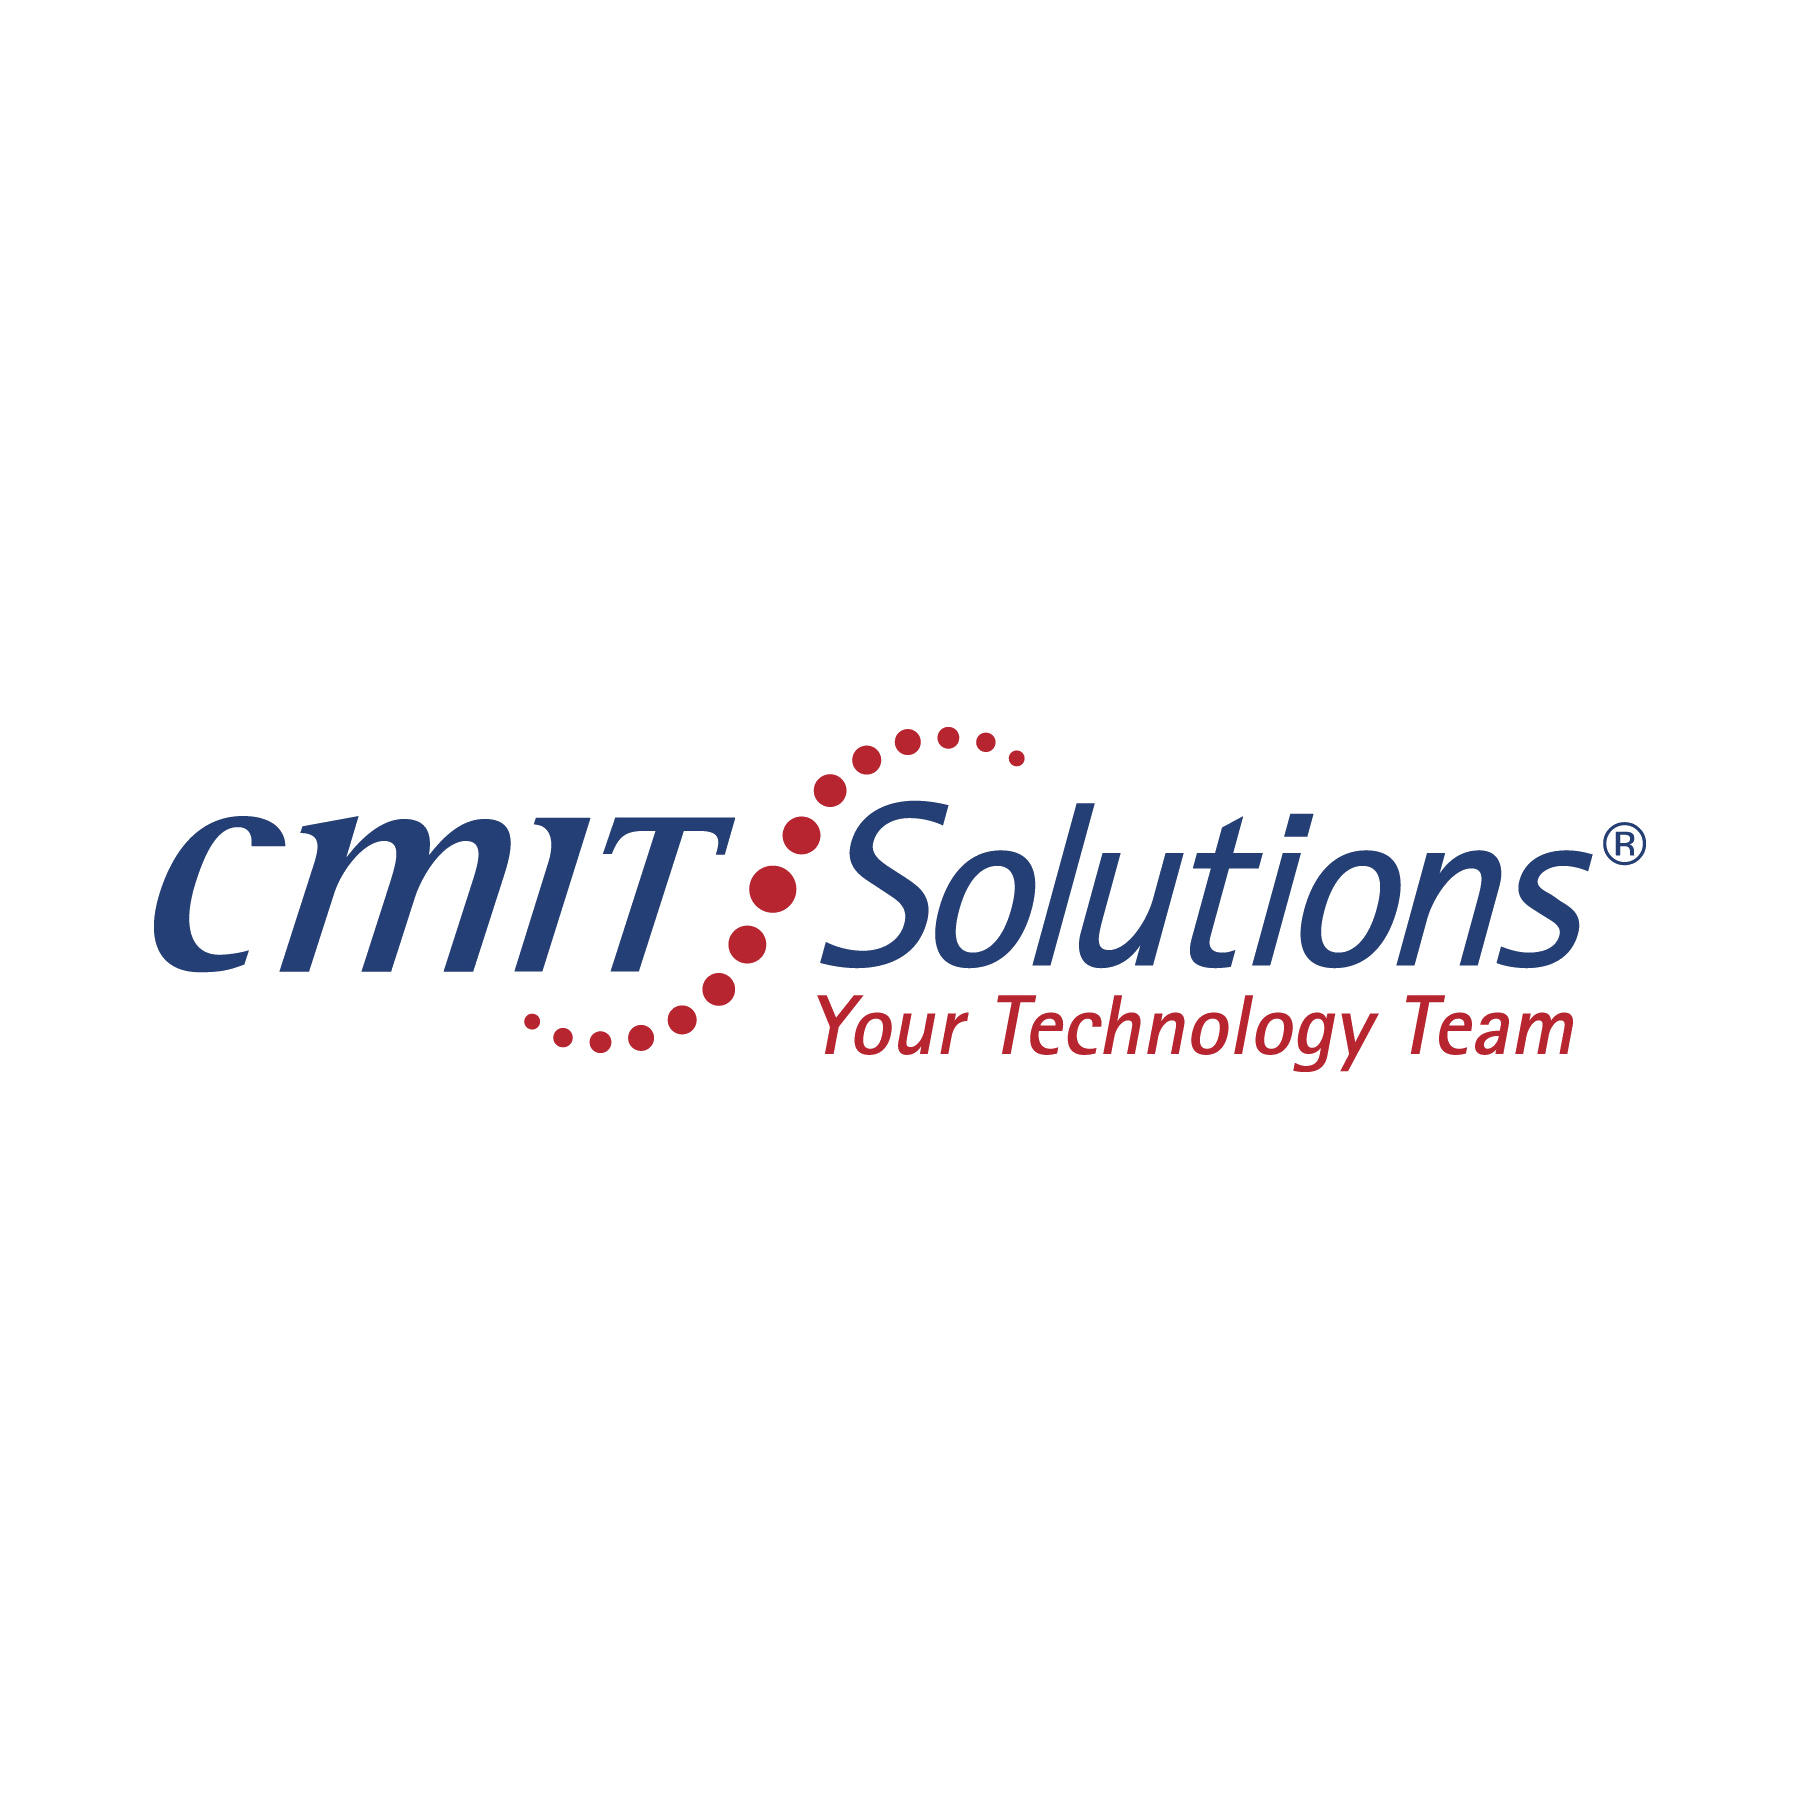 CMIT Solutions of Sammamish, Issaquah and Renton